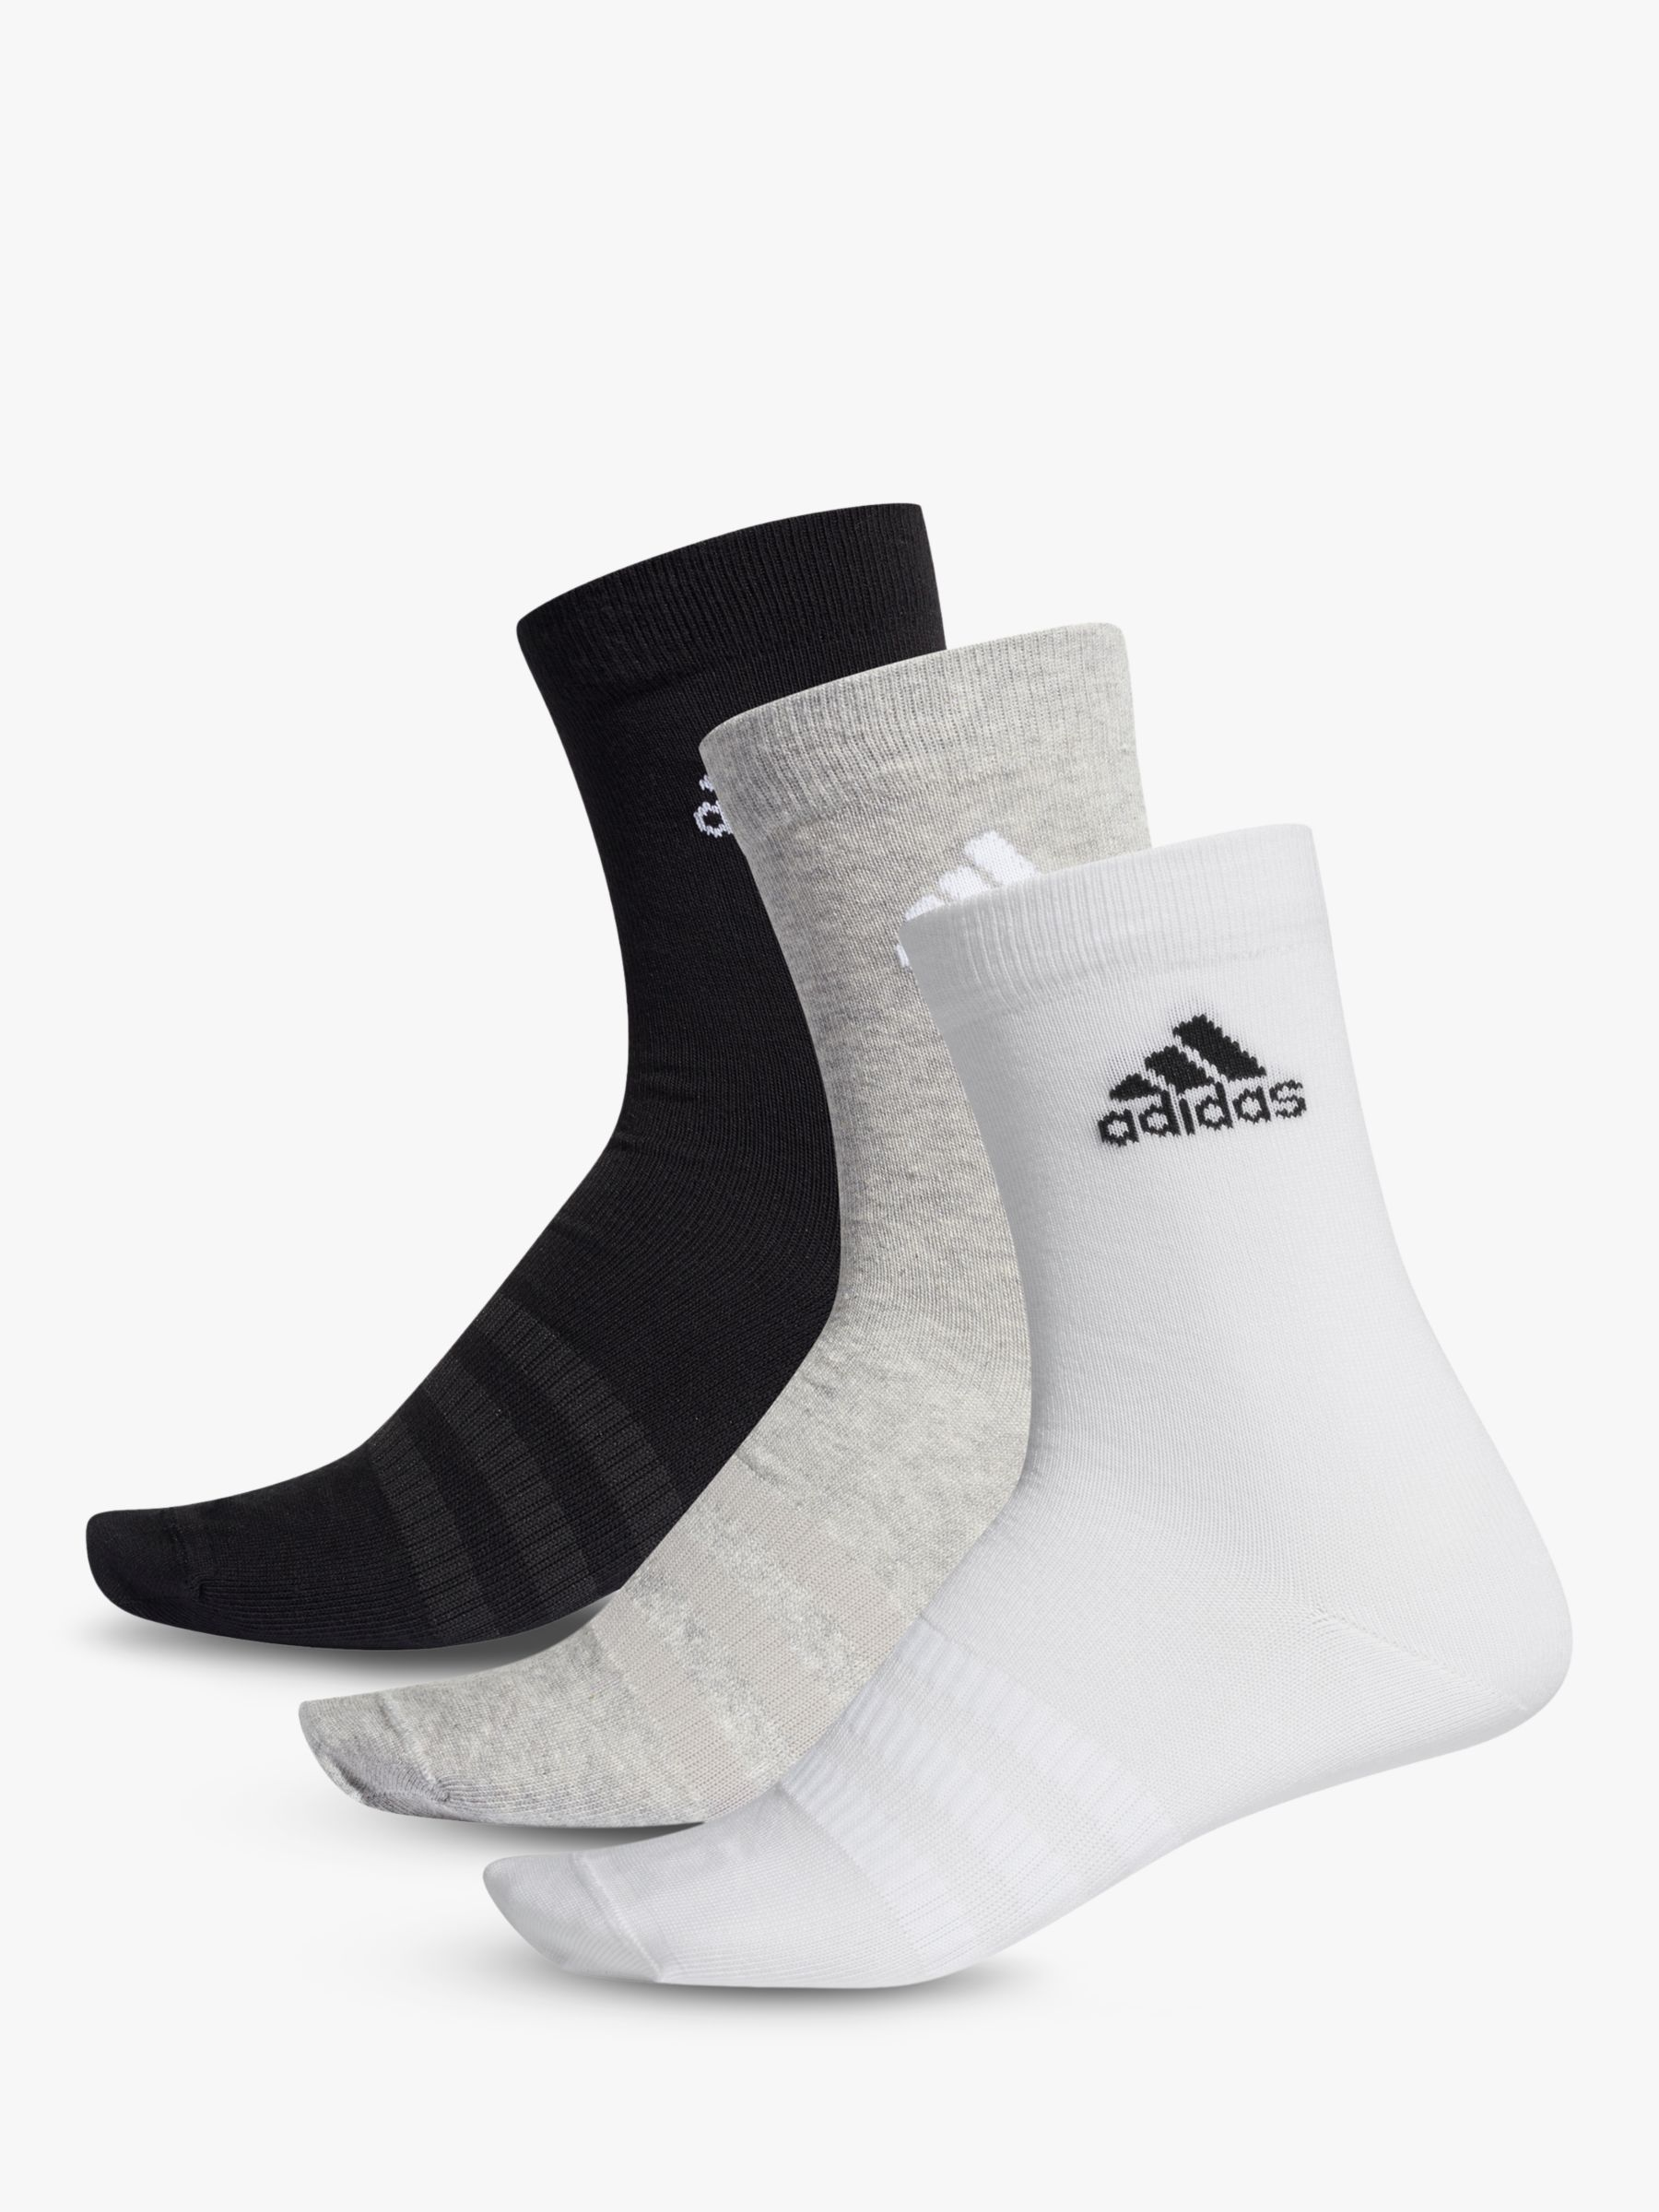 adidas Light Training Crew Socks, Pack of 3, Black